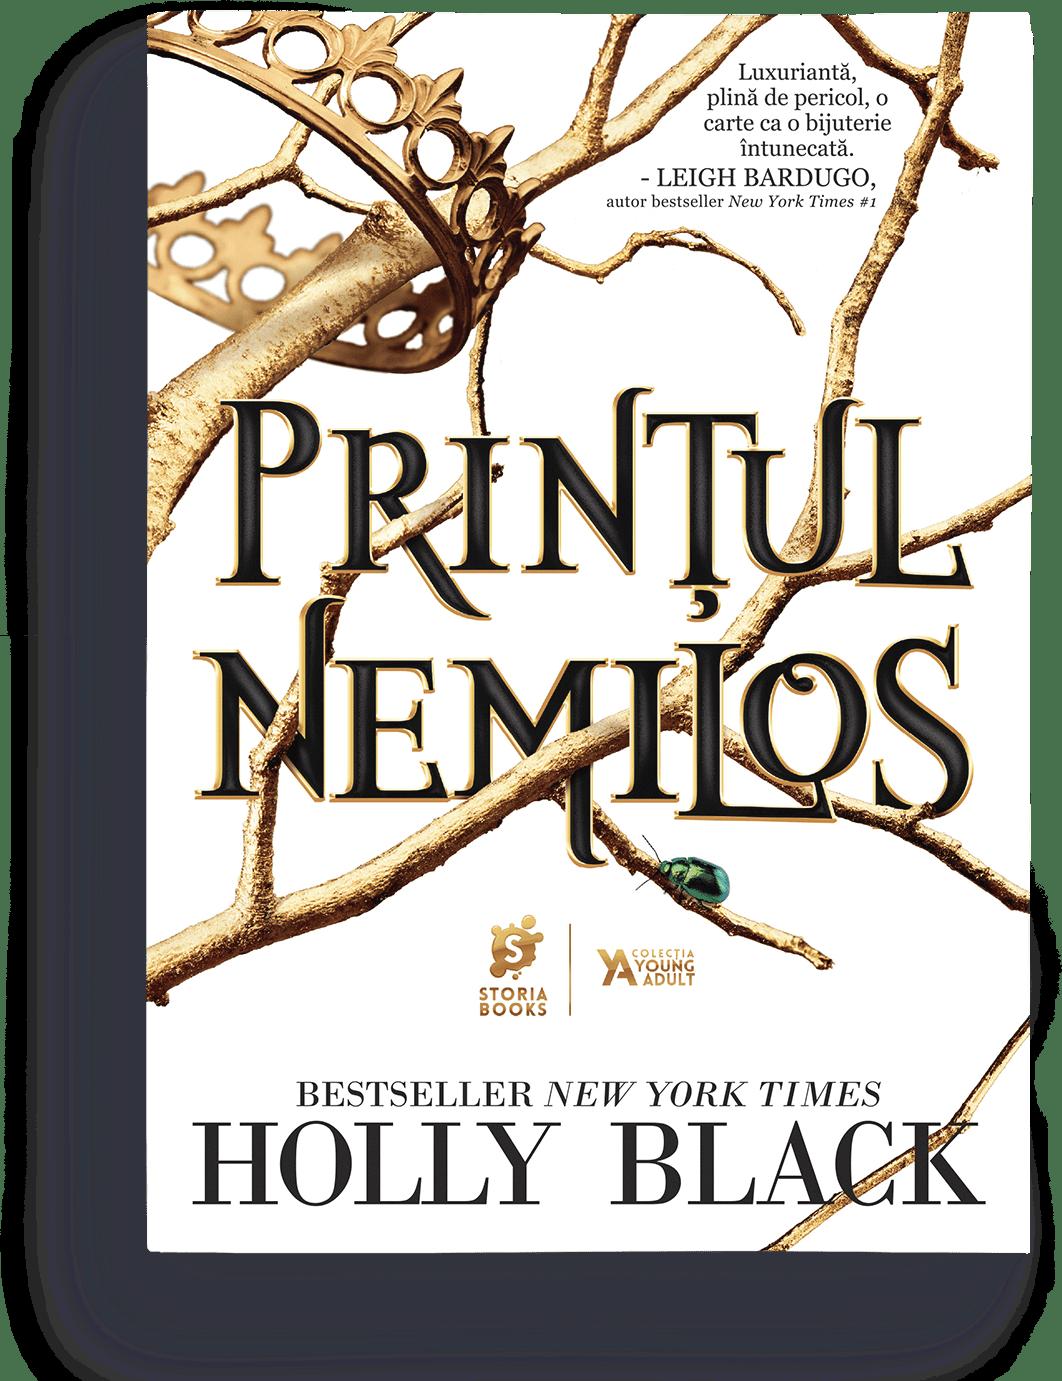 Holly Black · Prințul nemilos